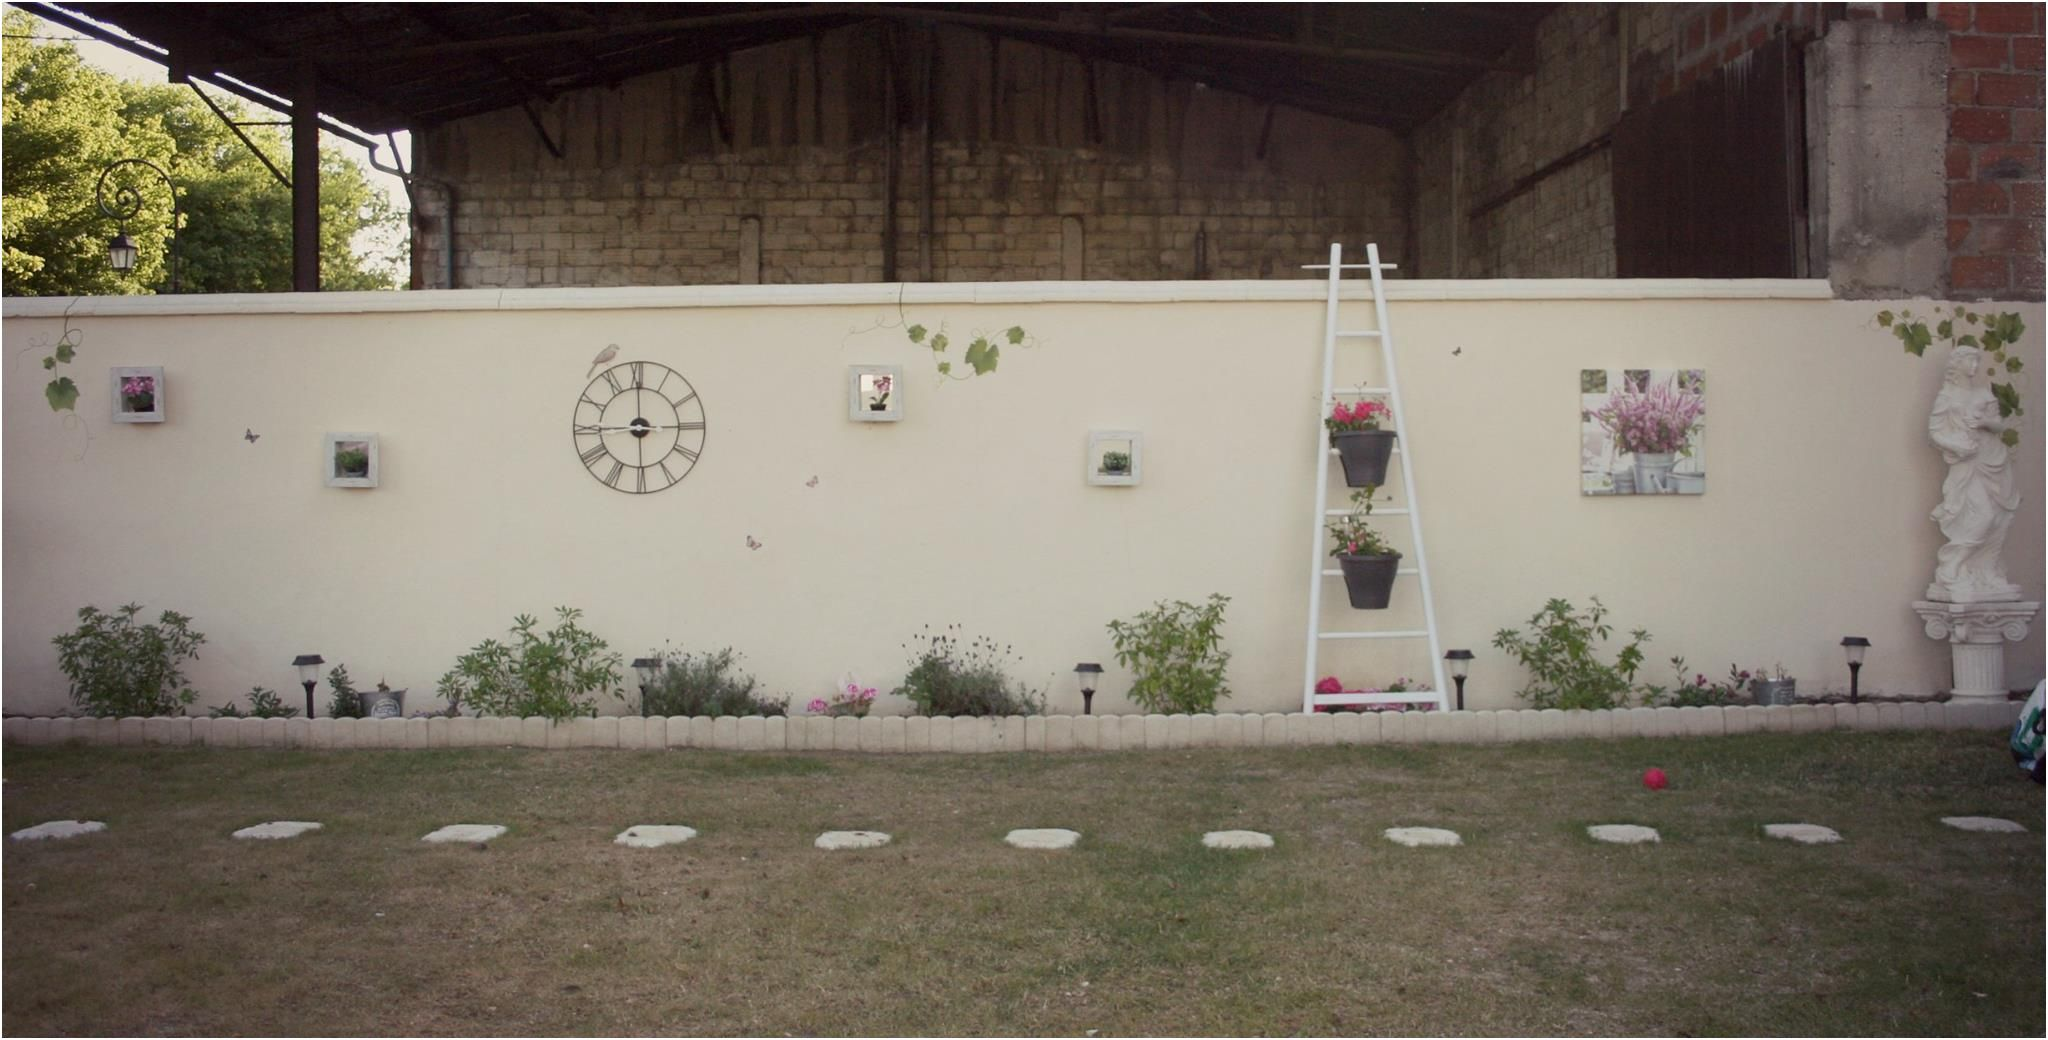 Habiller Un Mur Exterieur En Parpaing habiller un mur en parpaing avec du bois exterieur pierre en